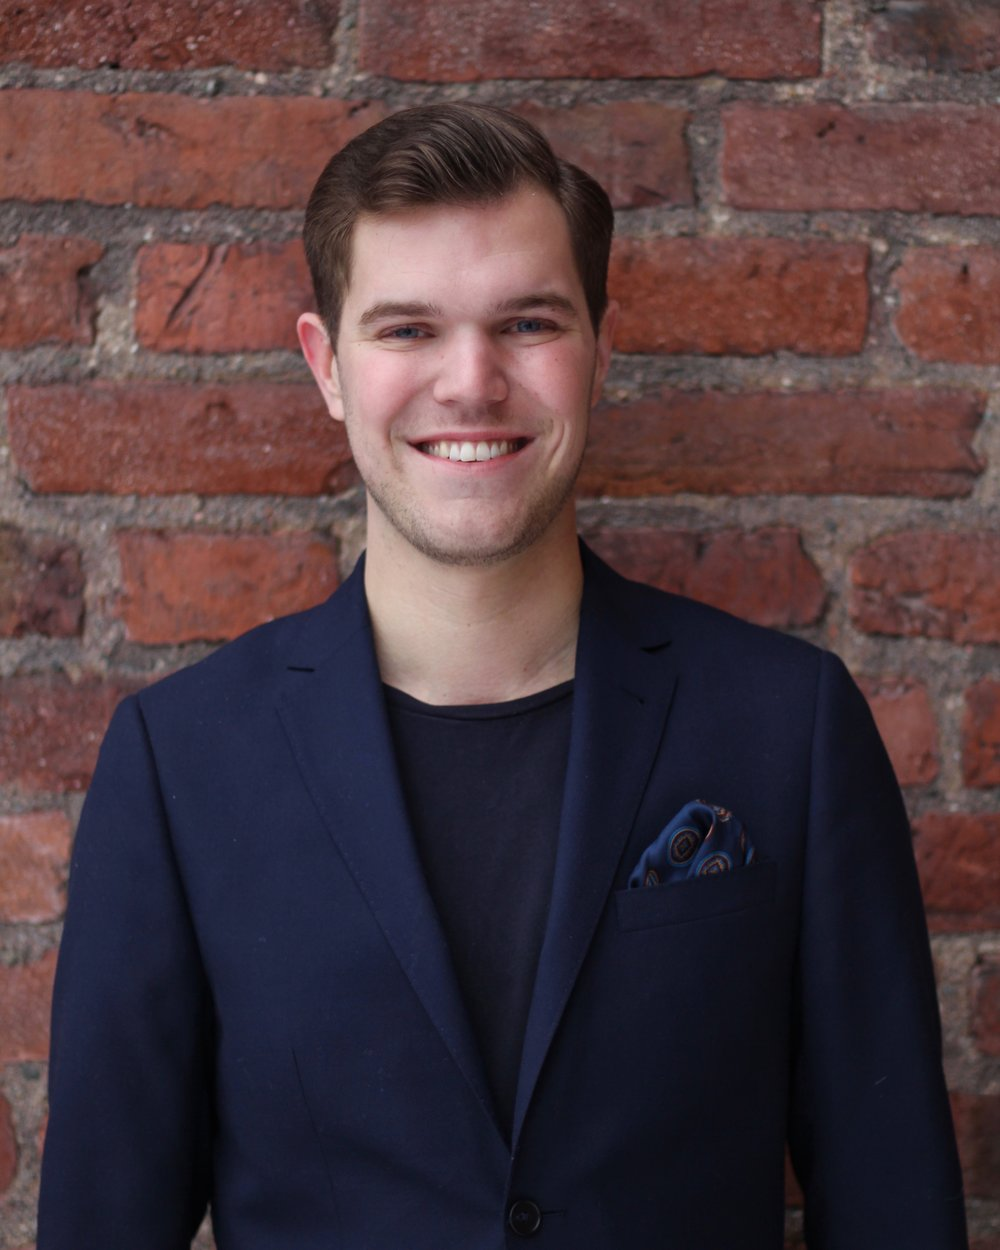 John Karlsson   Head of Collaborative Relations  john.karlsson@entrepreneursacademy.se +46 70 787 36 81